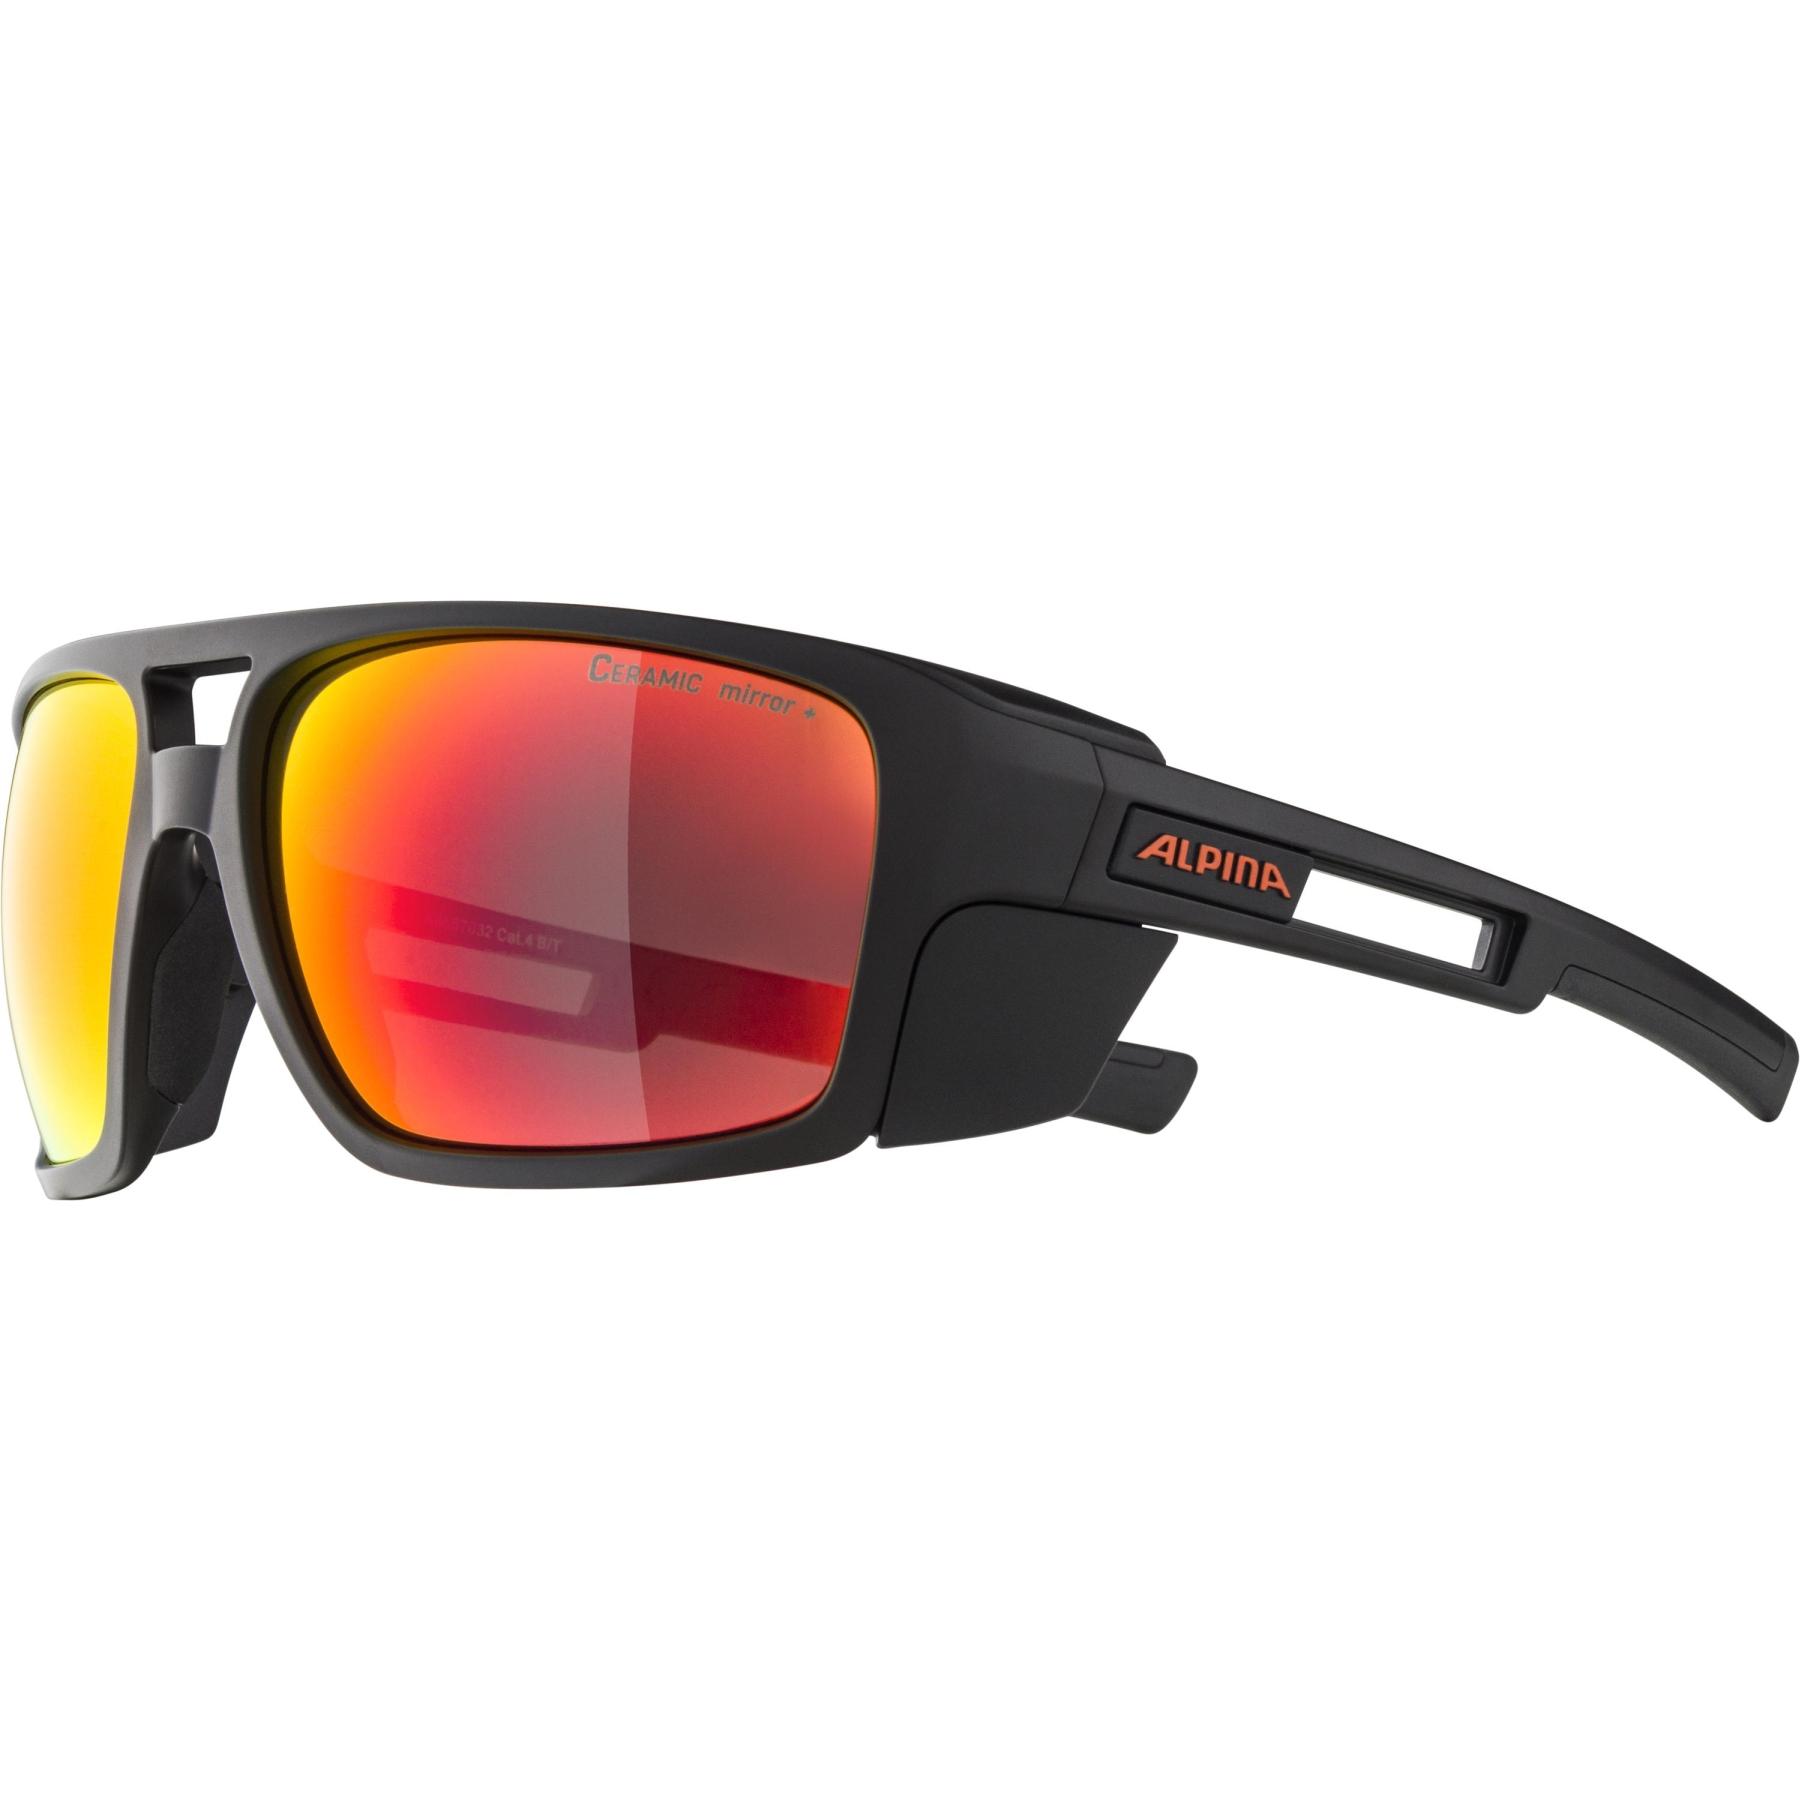 Image of Alpina Skywalsch CM+ Glasses - black matt / red mirror